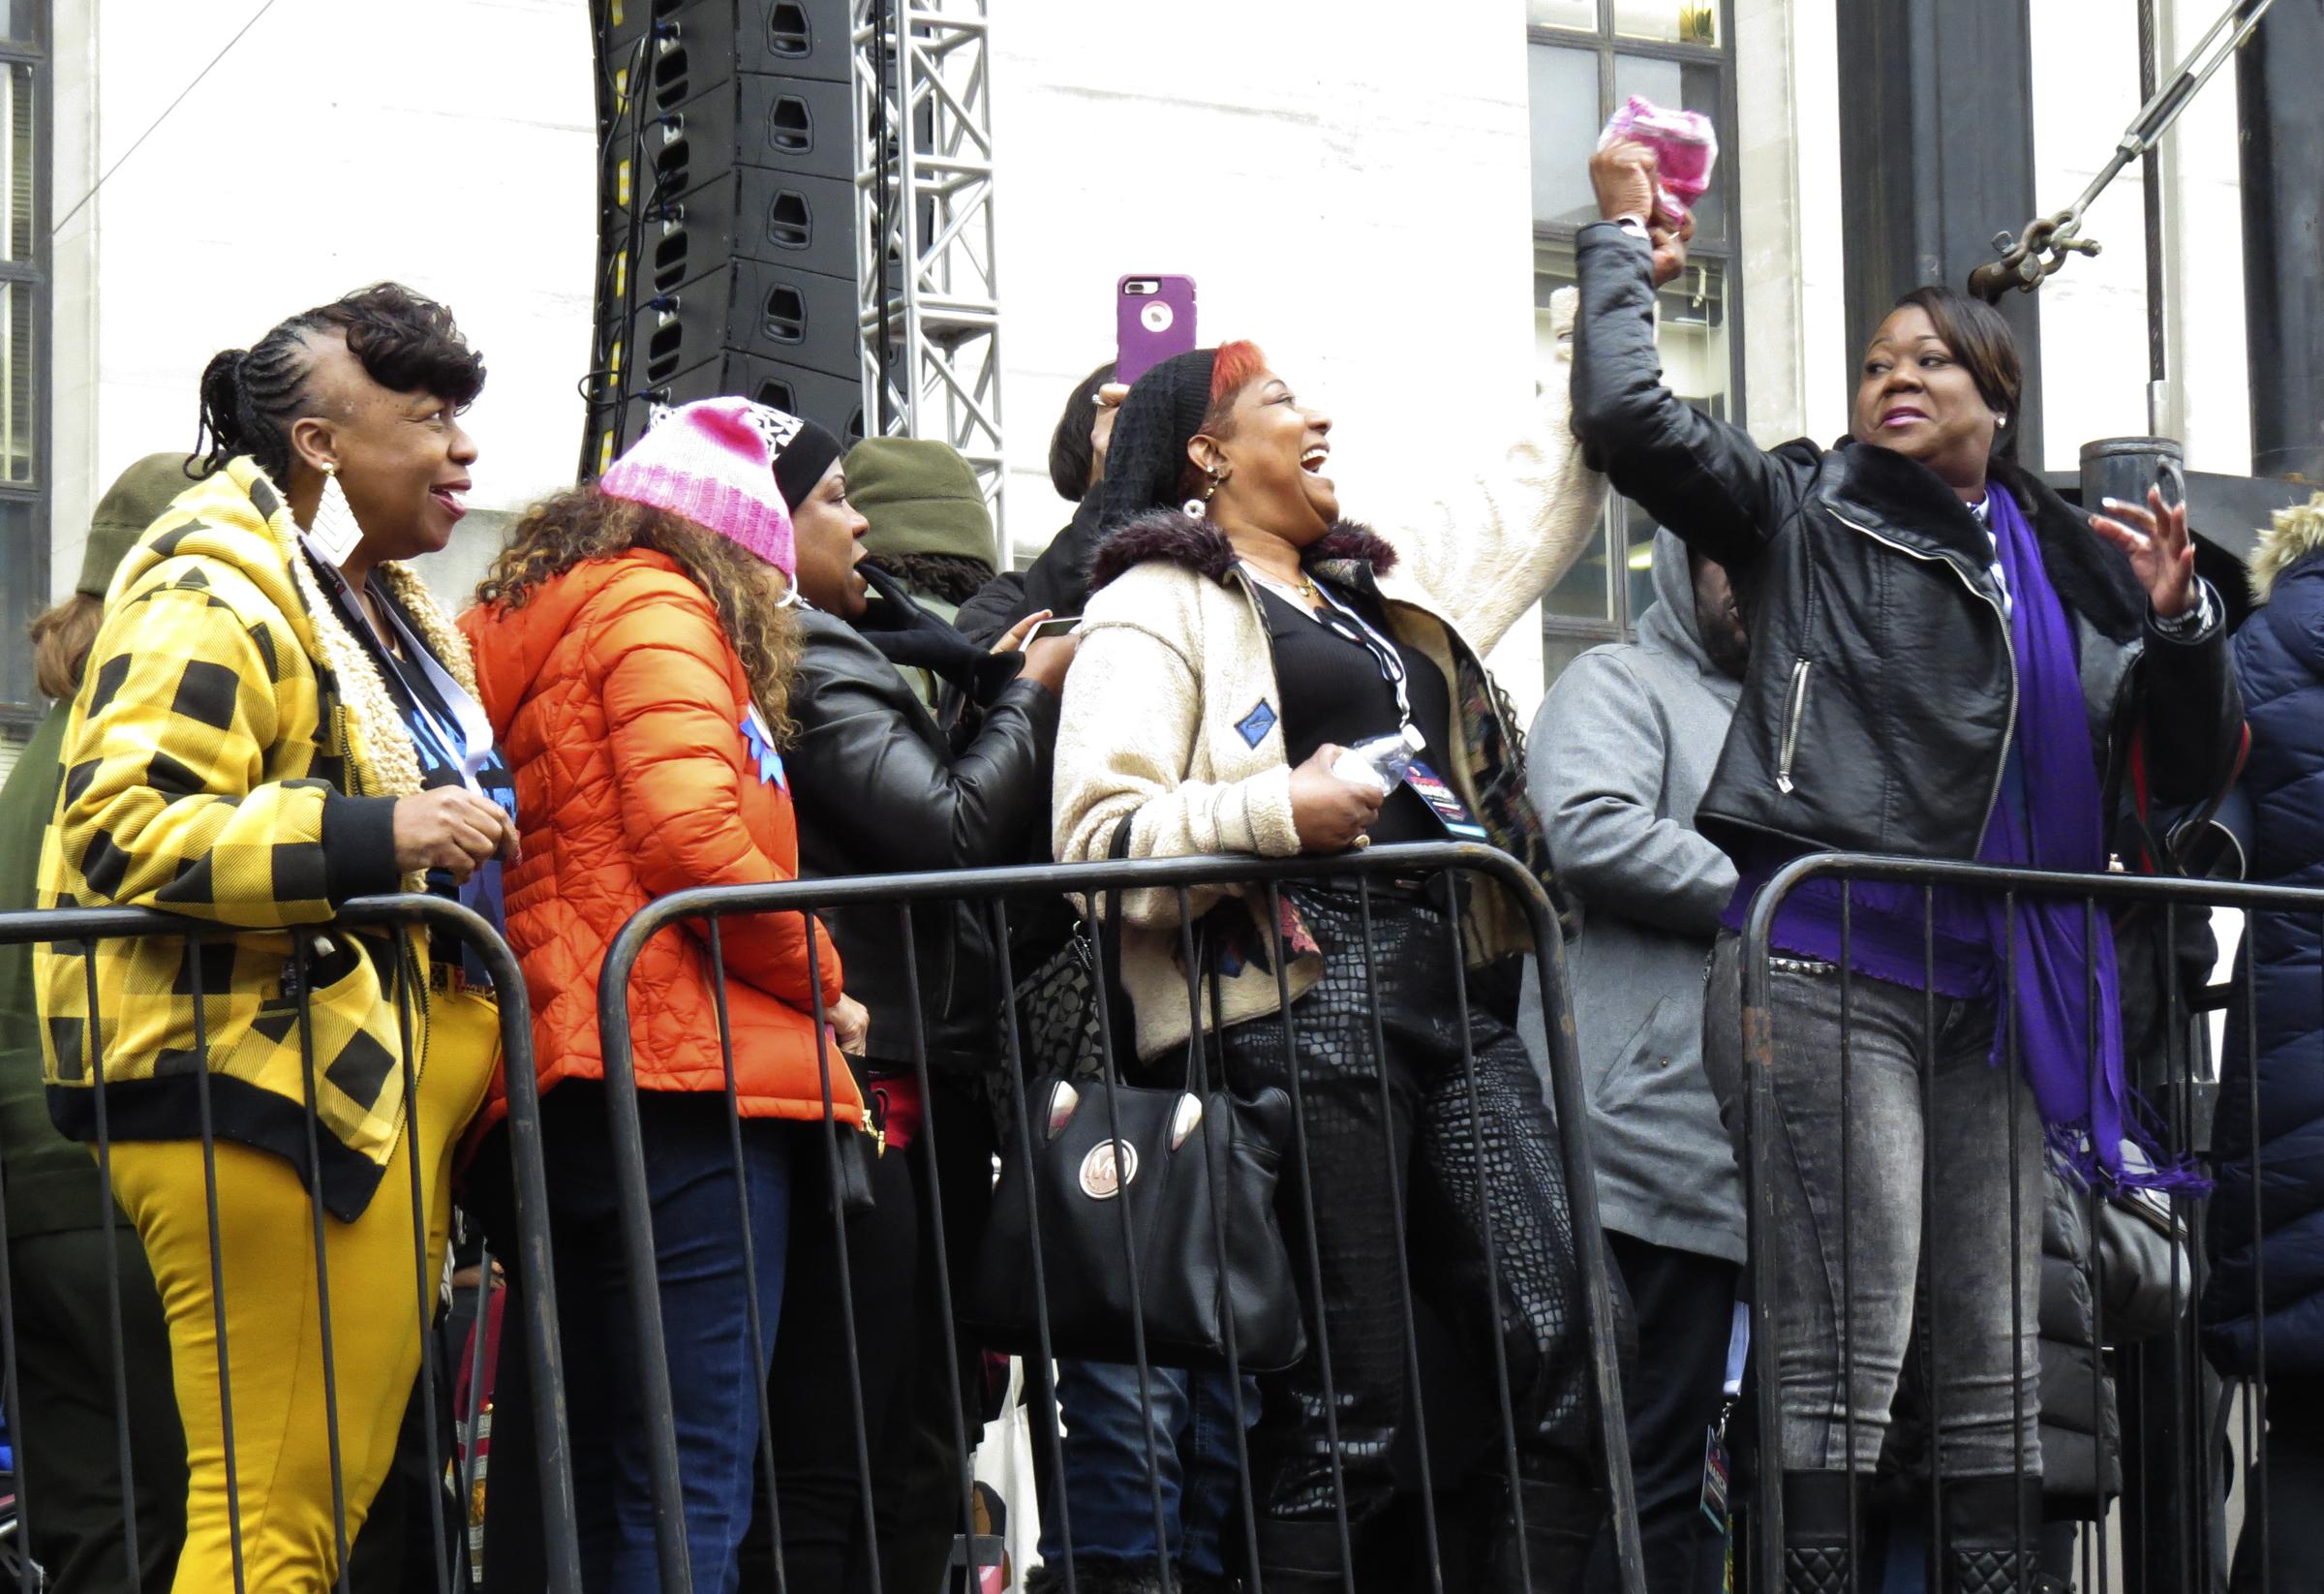 Mothers of Trayvon Martin, Jordan Davis, Eric Garner, Mohamed Bah, and Dontre Hamilton // Women's March on Washington